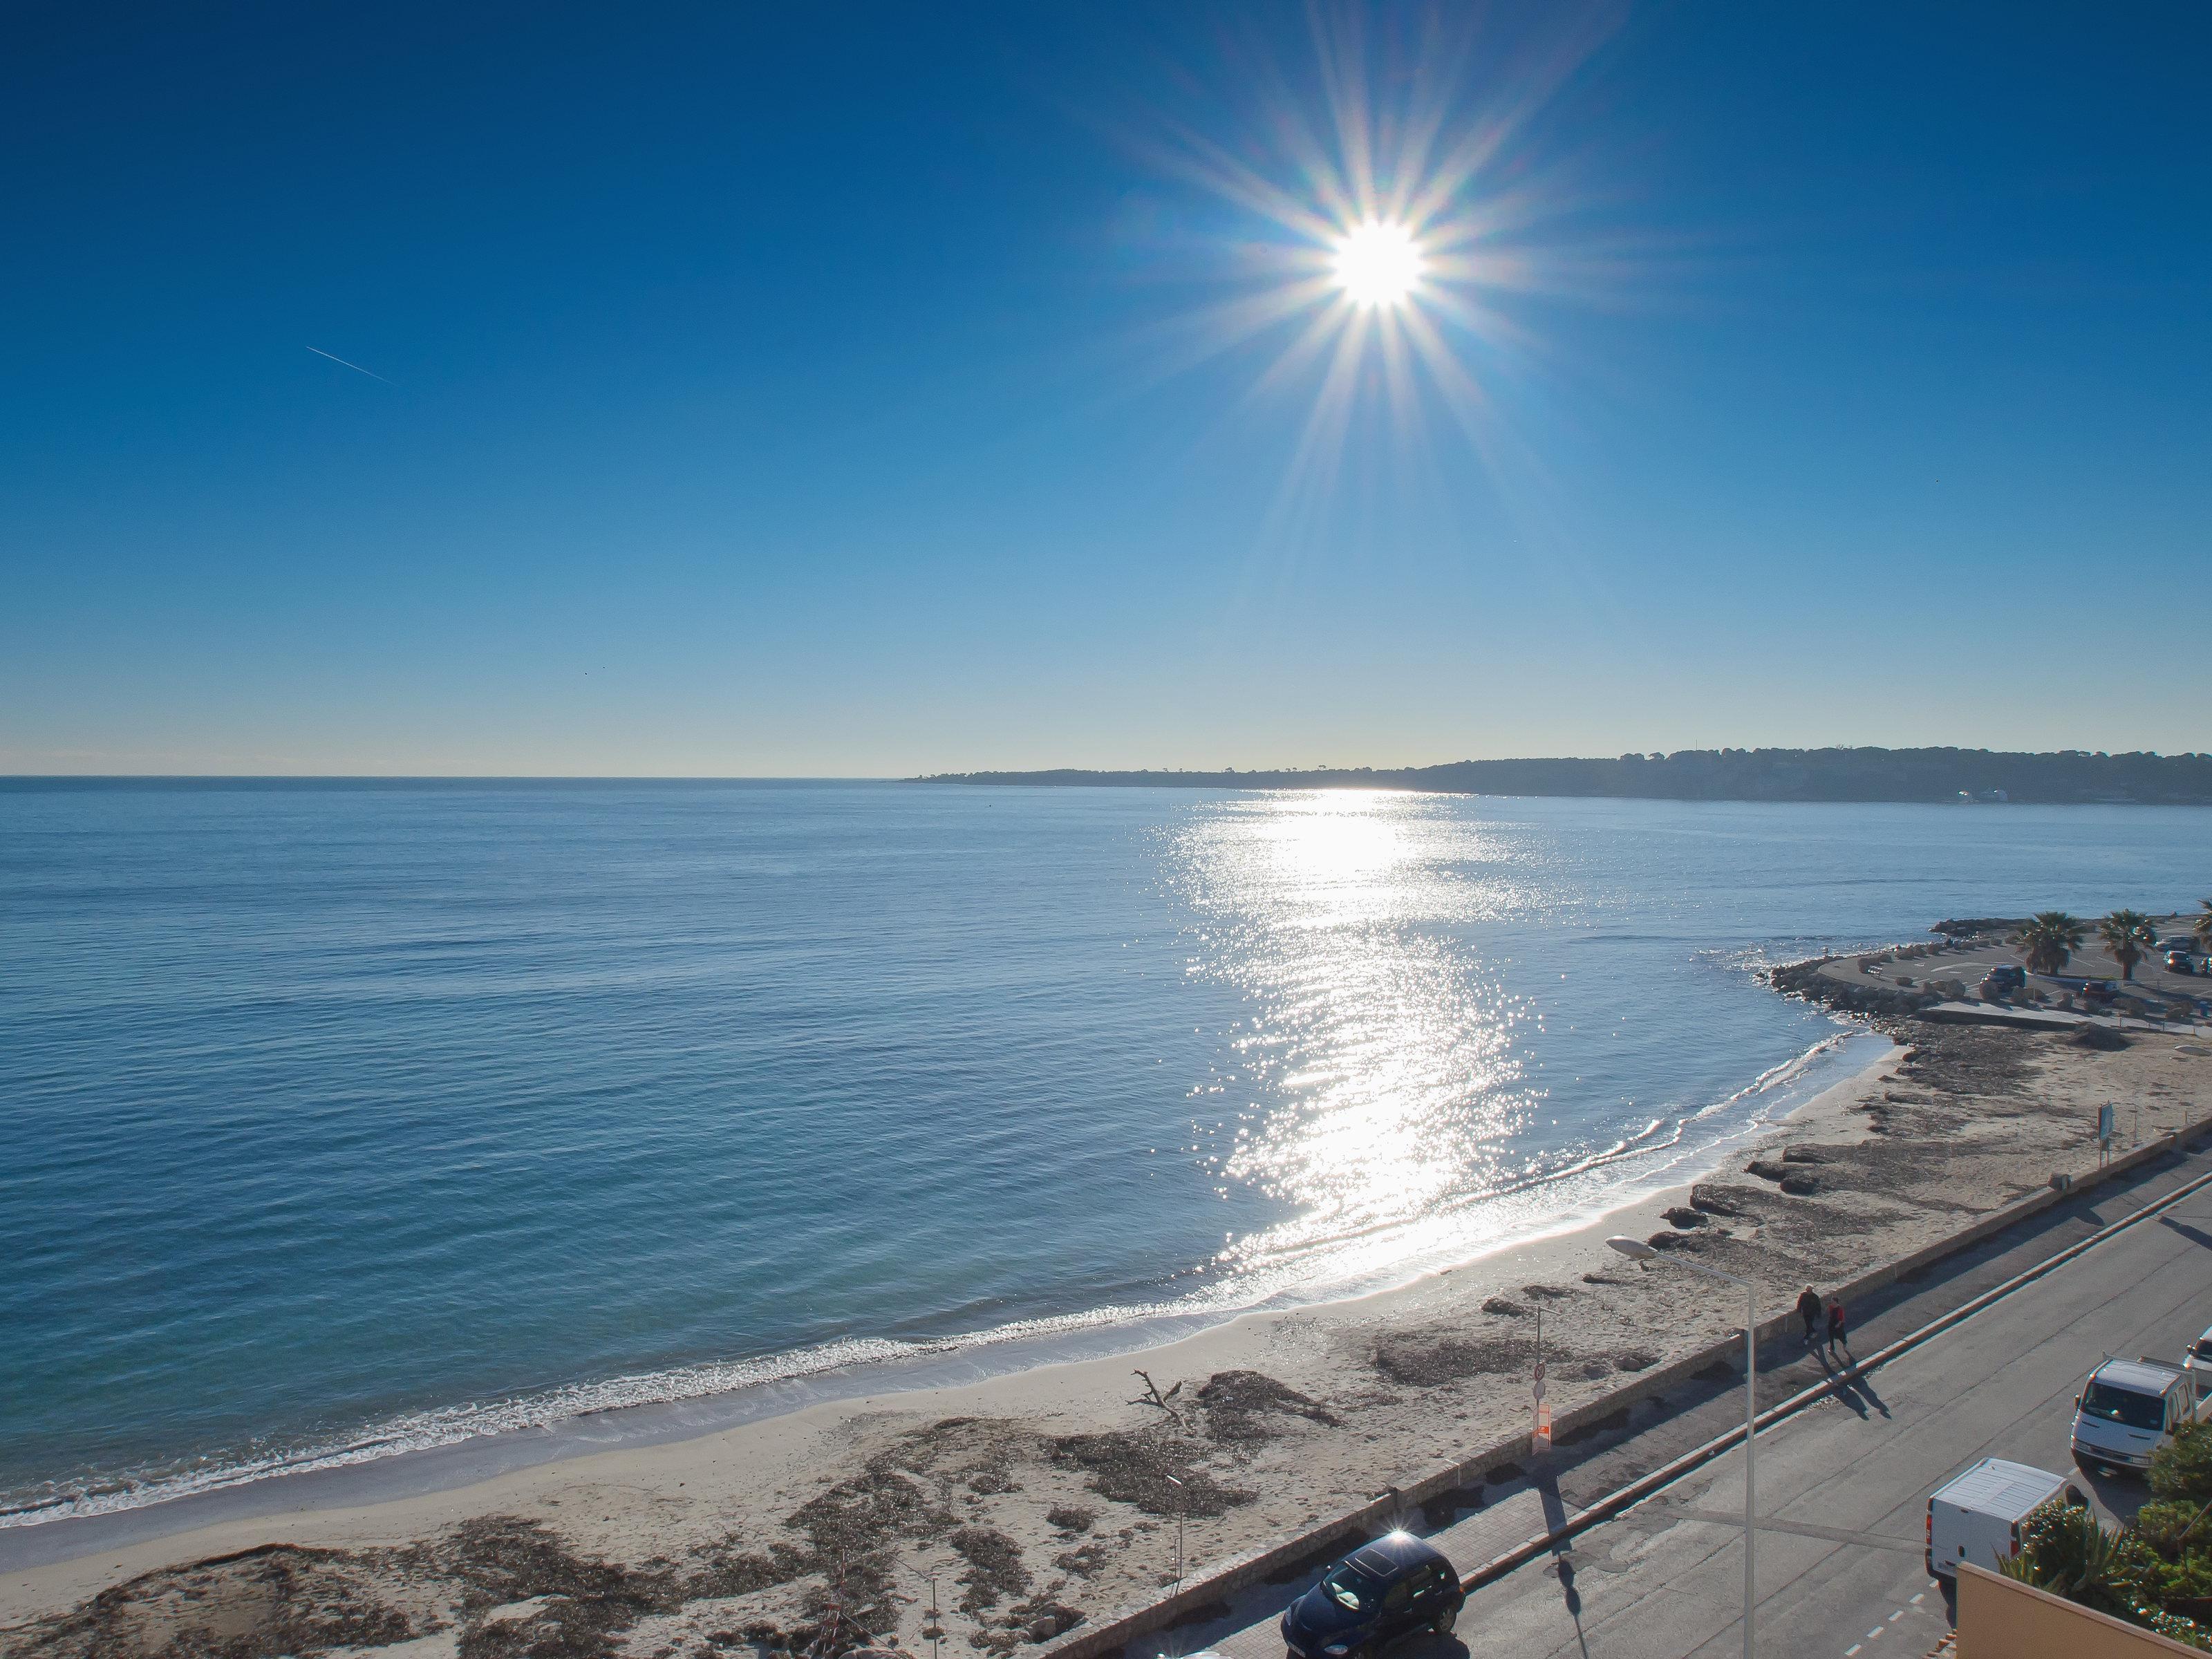 Căn hộ vì Bán tại Top floor apartment with roof terrace Cannes, Provence-Alpes-Cote D'Azur, 06400 Pháp